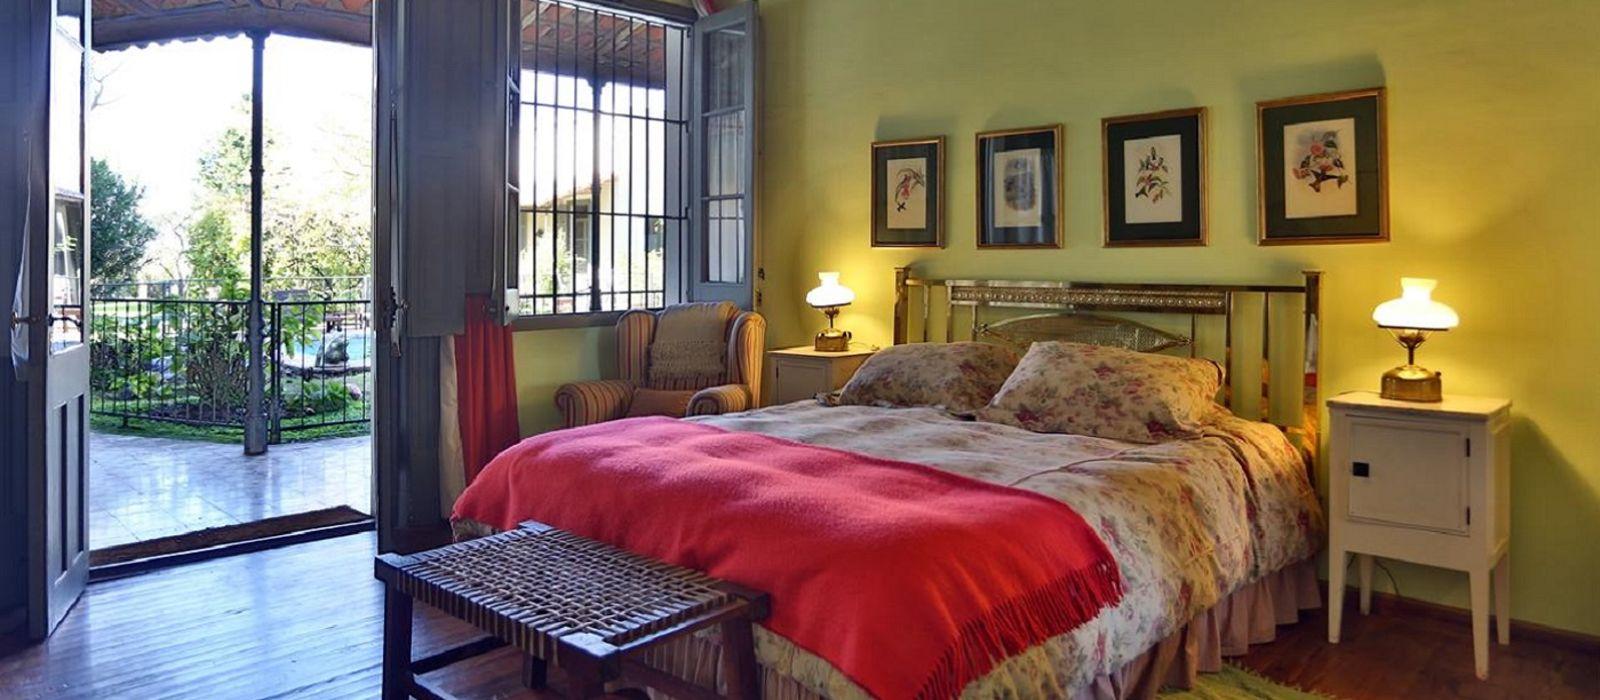 Hotel Estancia El Ombu de Areco Argentina